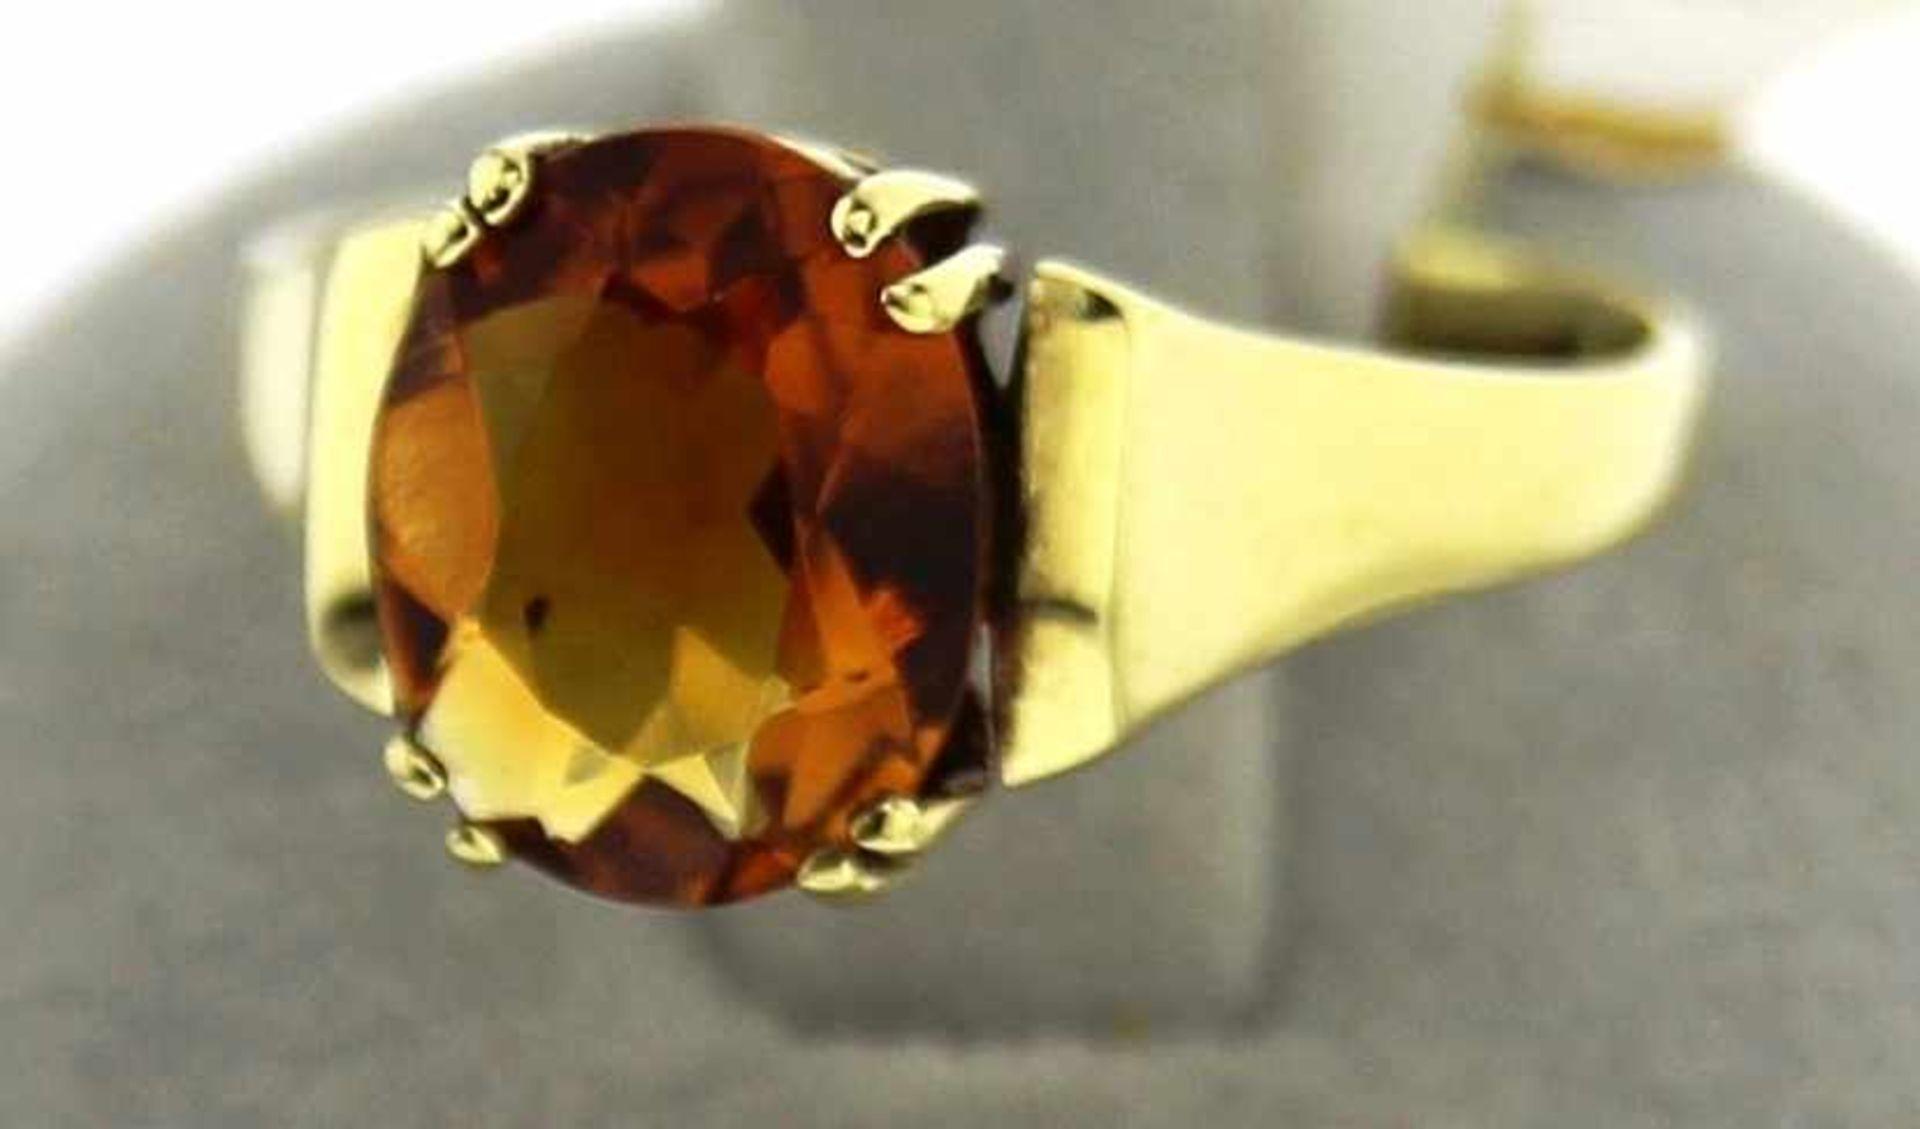 Damenring 585 mit ovalem Topas, NOS Gr. 55, Gesamtgewicht ca. 3,2 Gramm, Topas ca. 10 x 8mm, NOS